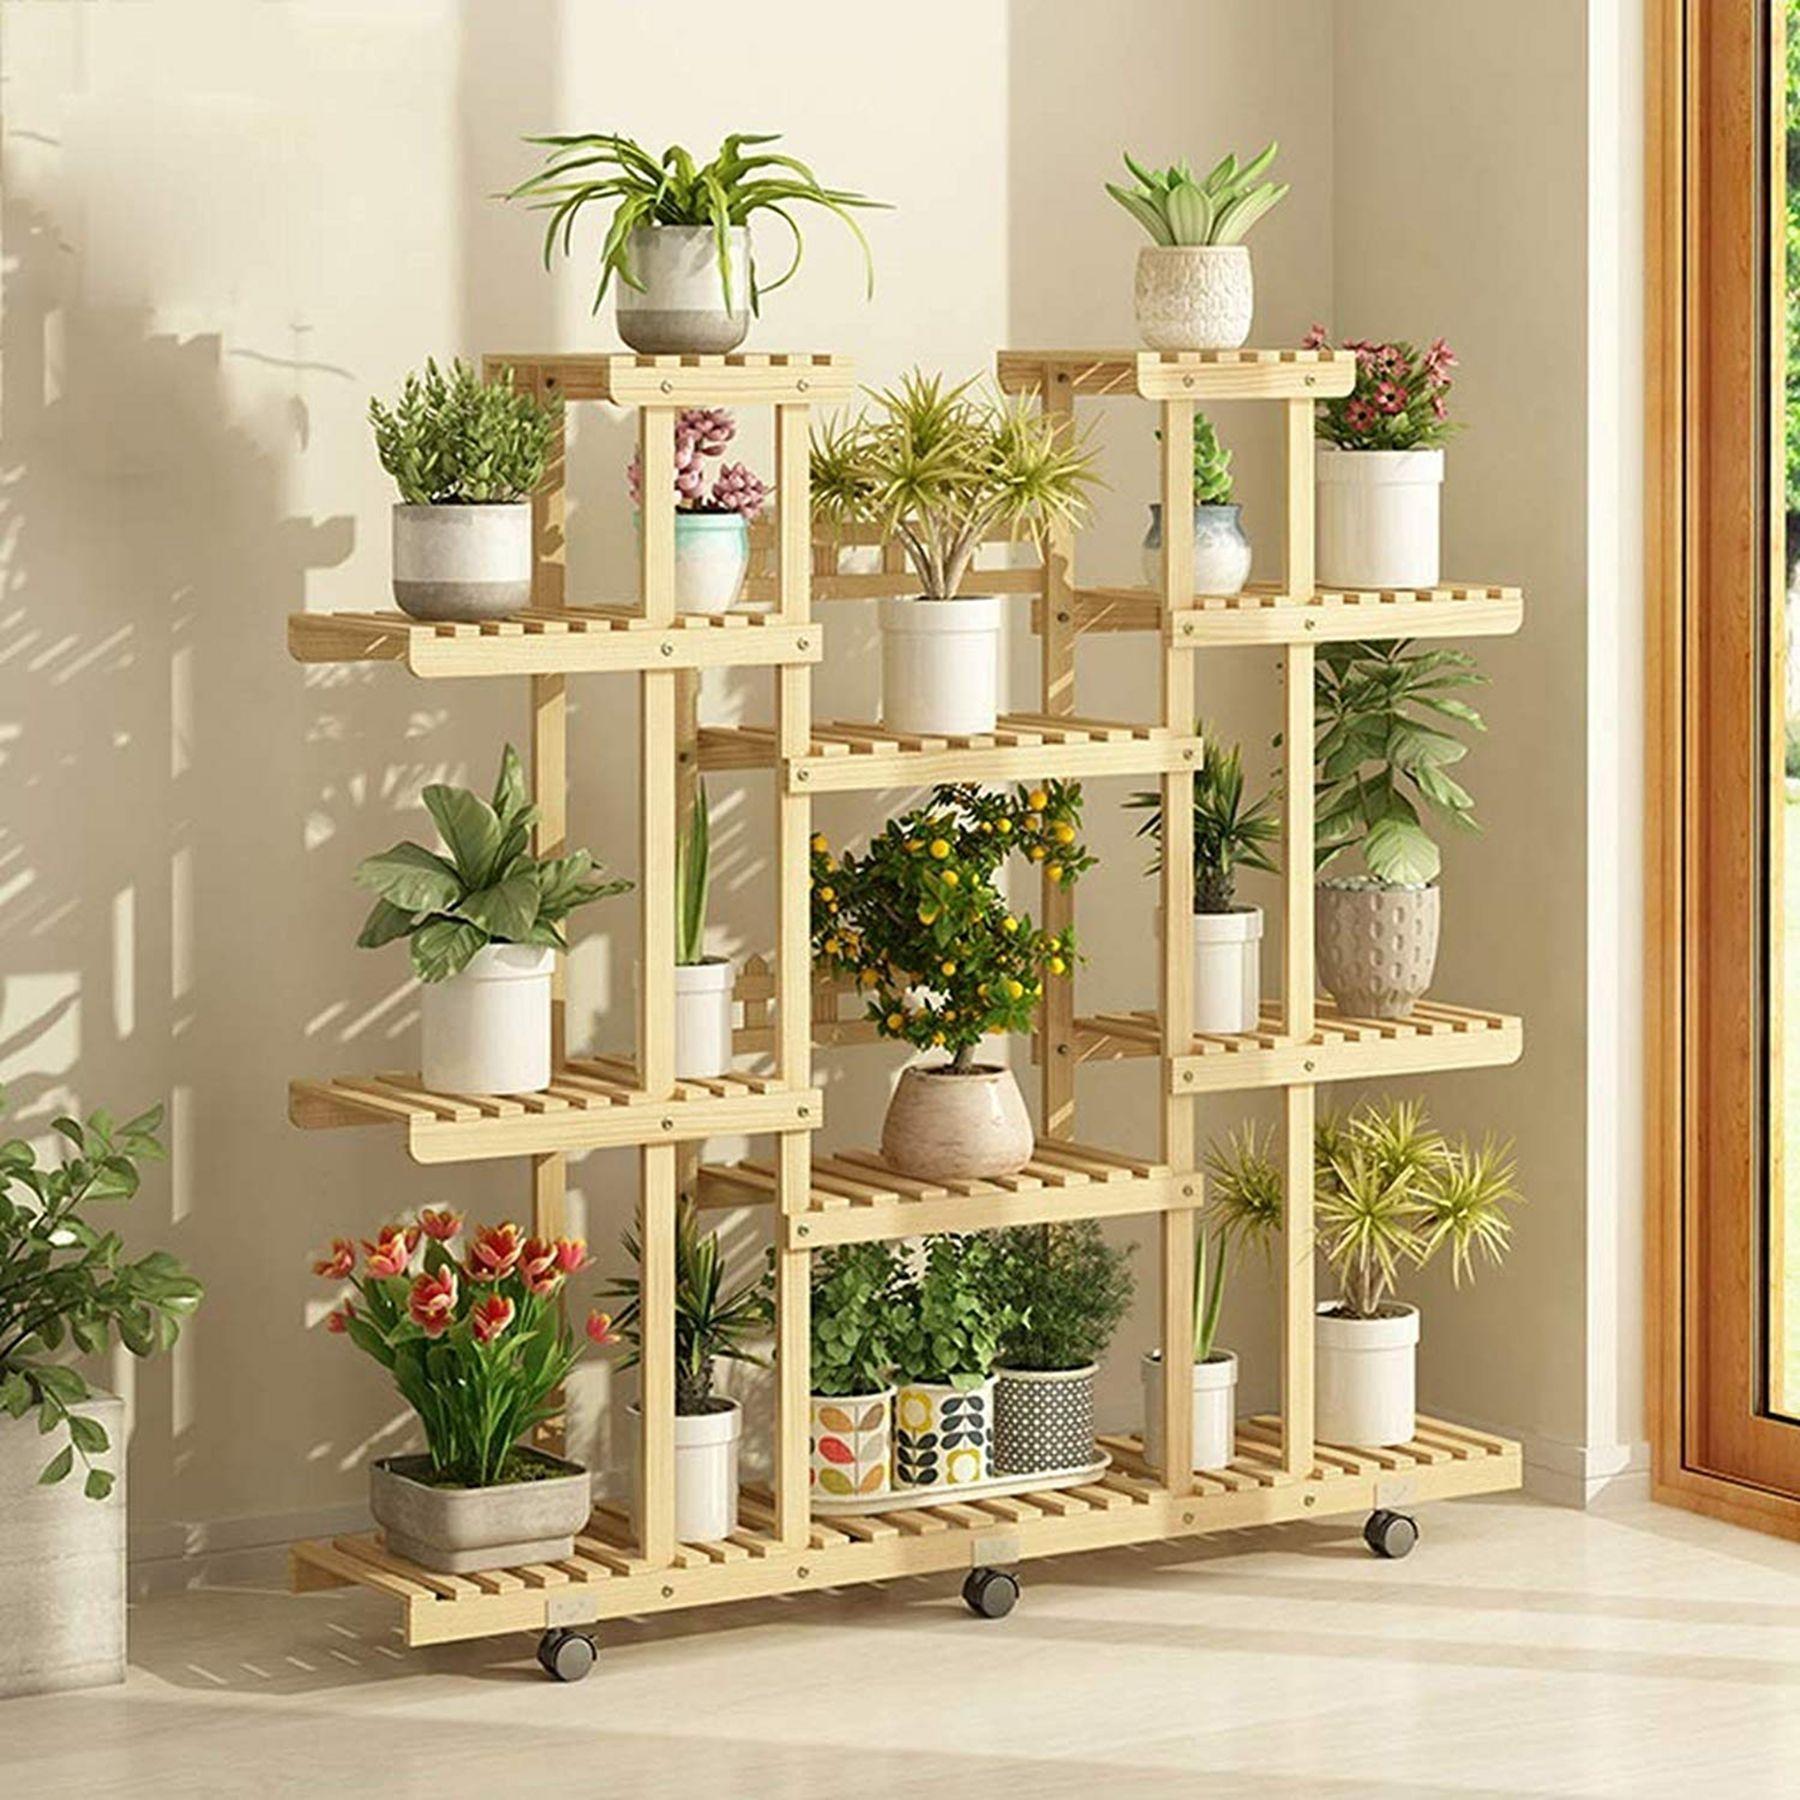 12 Interesting Flower Shelf Design Ideas As Your Home Decoration Flowershelfdecoration Flo Plant Stands Outdoor Plant Decor Indoor House Plants Decor